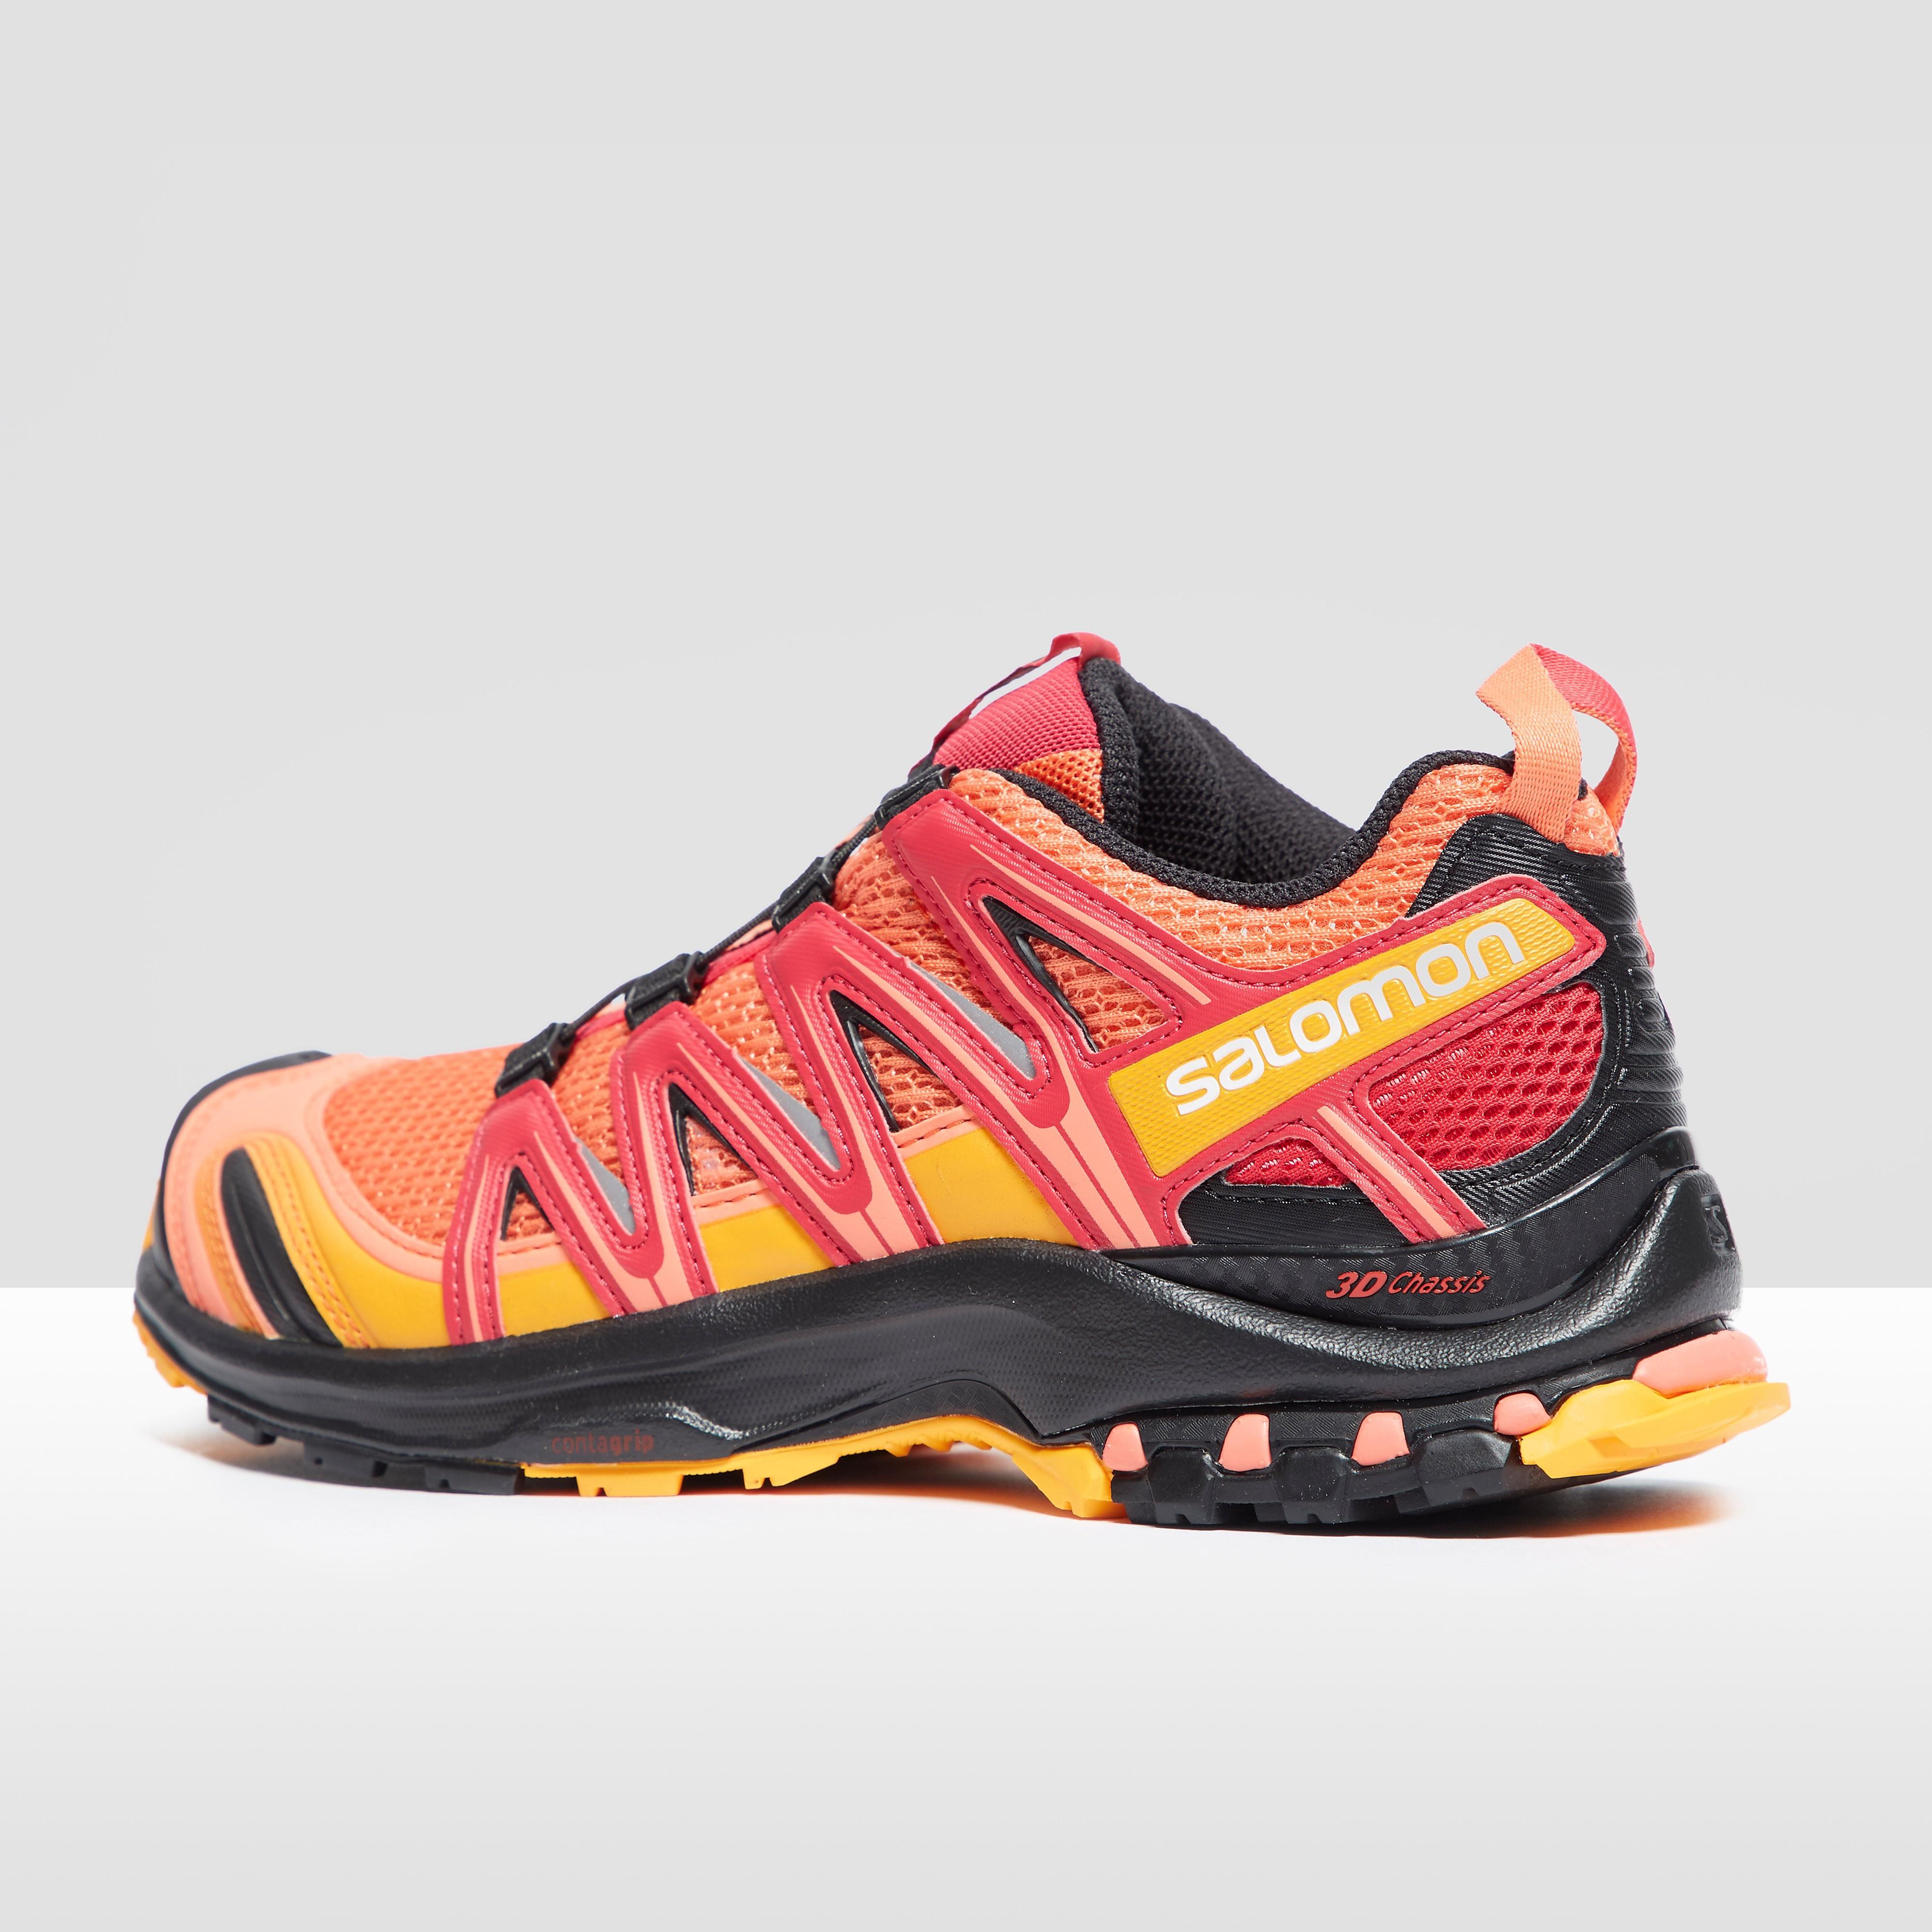 Salomon XA PRO 3D Trail Women's Running Shoes